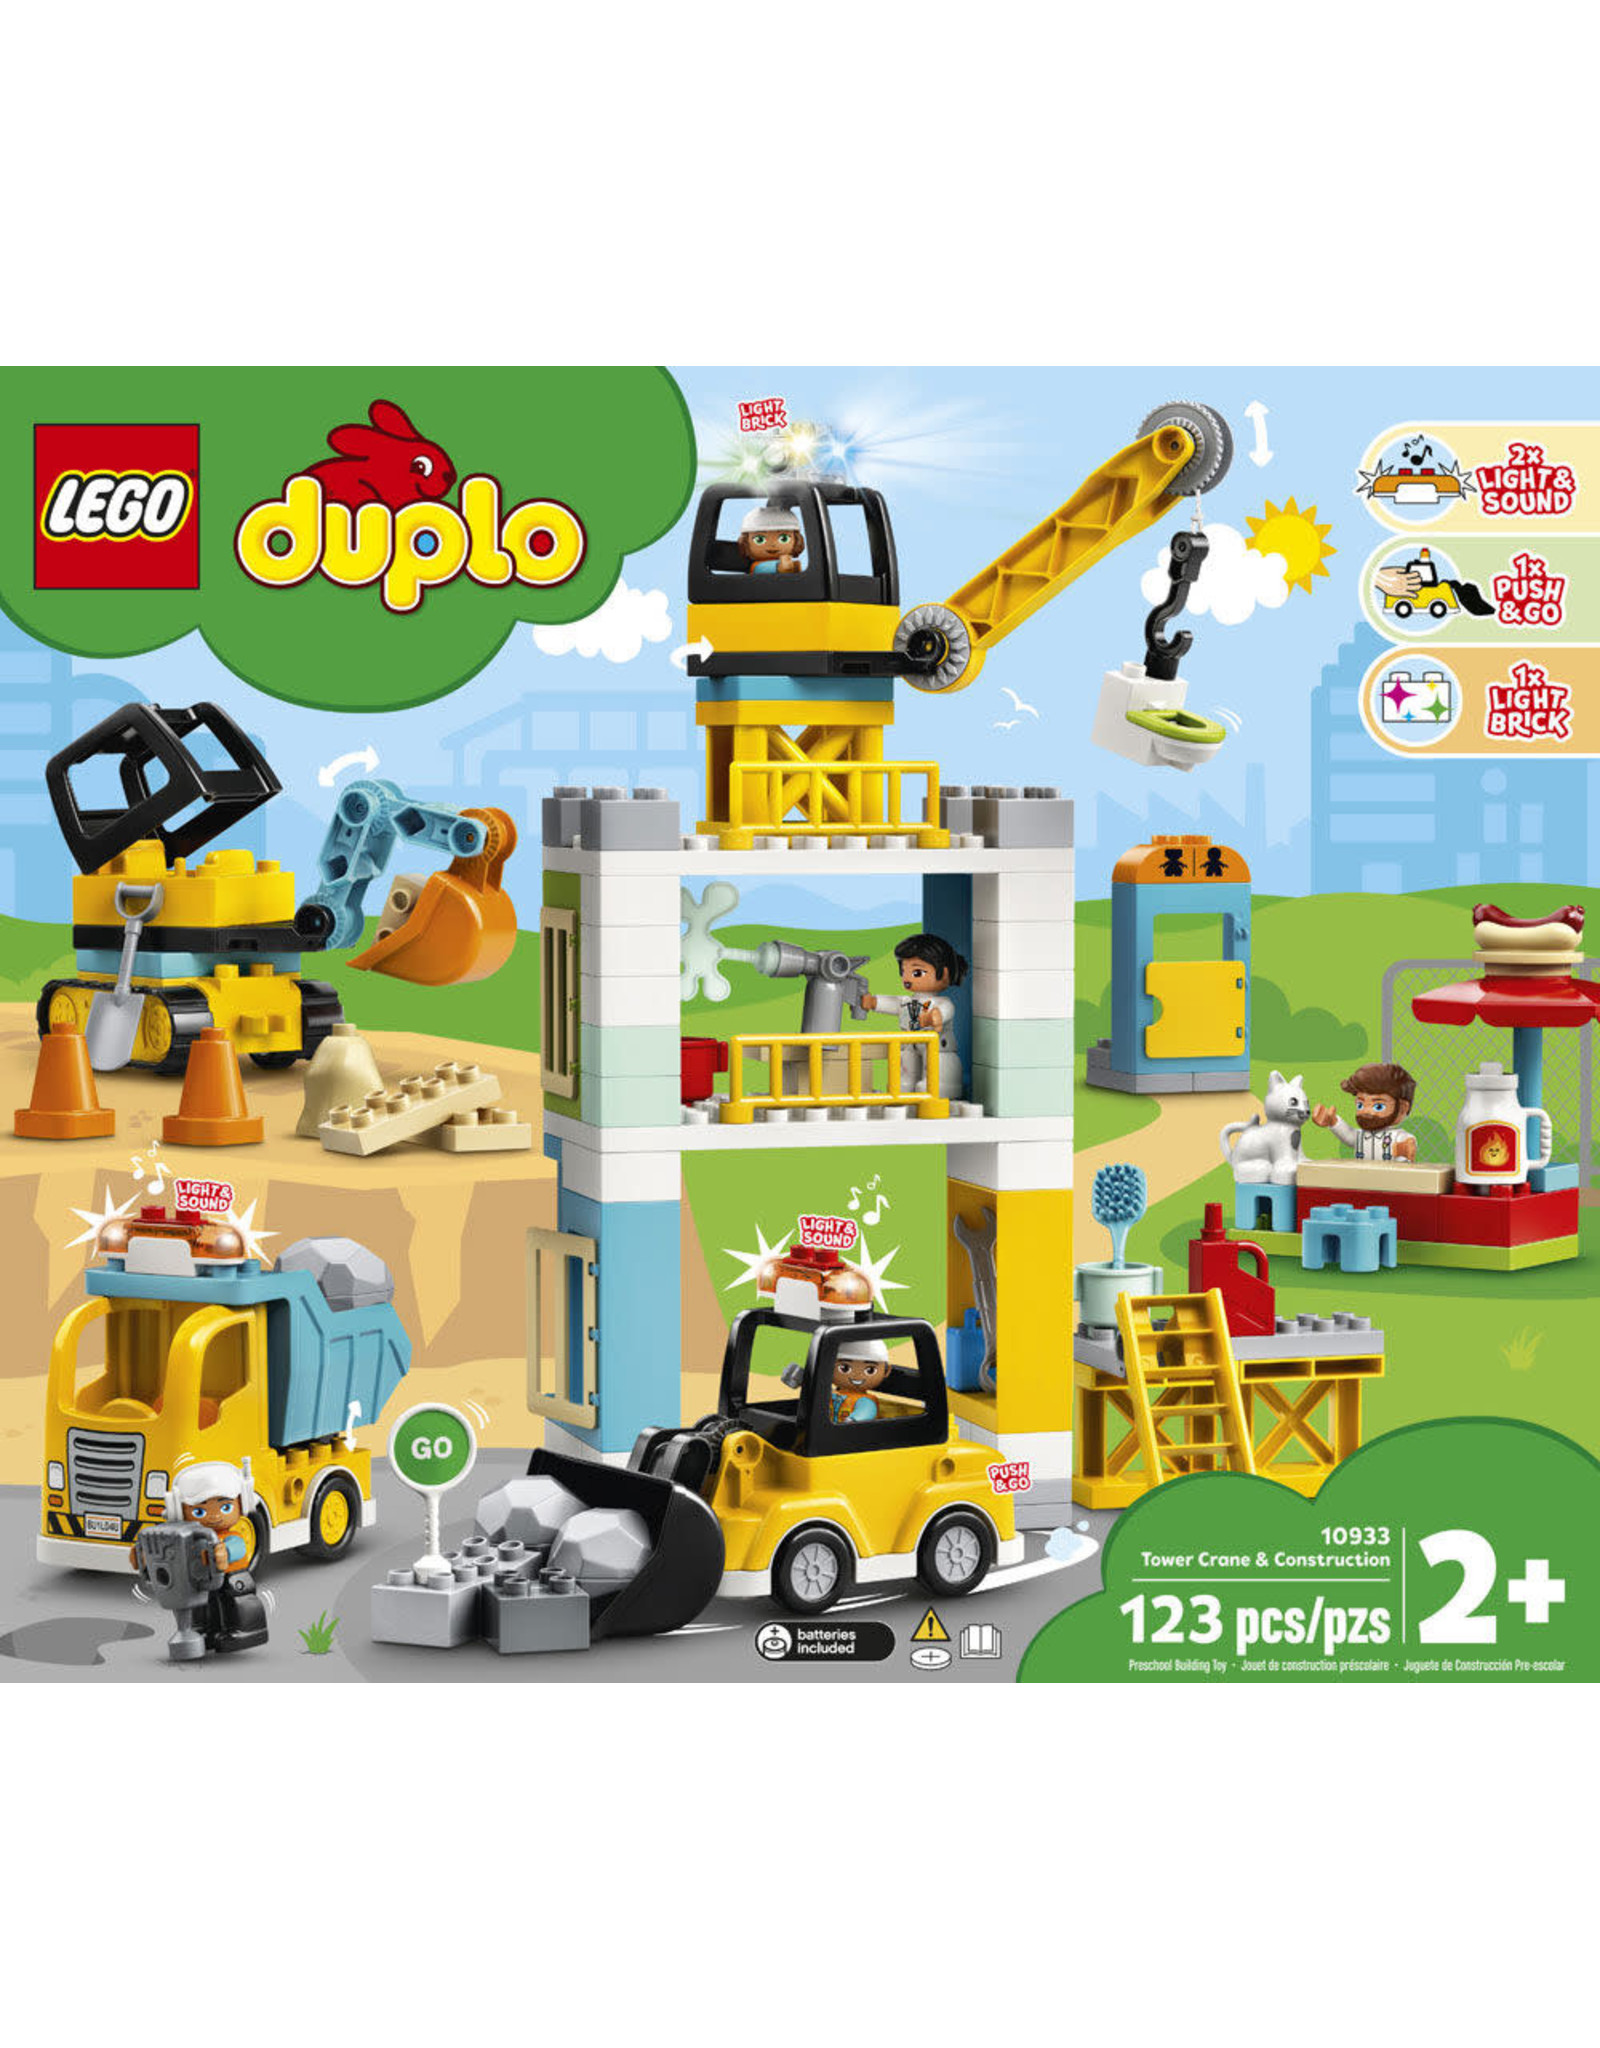 LEGO Duplo - 10933 - Tower Crane & Construction